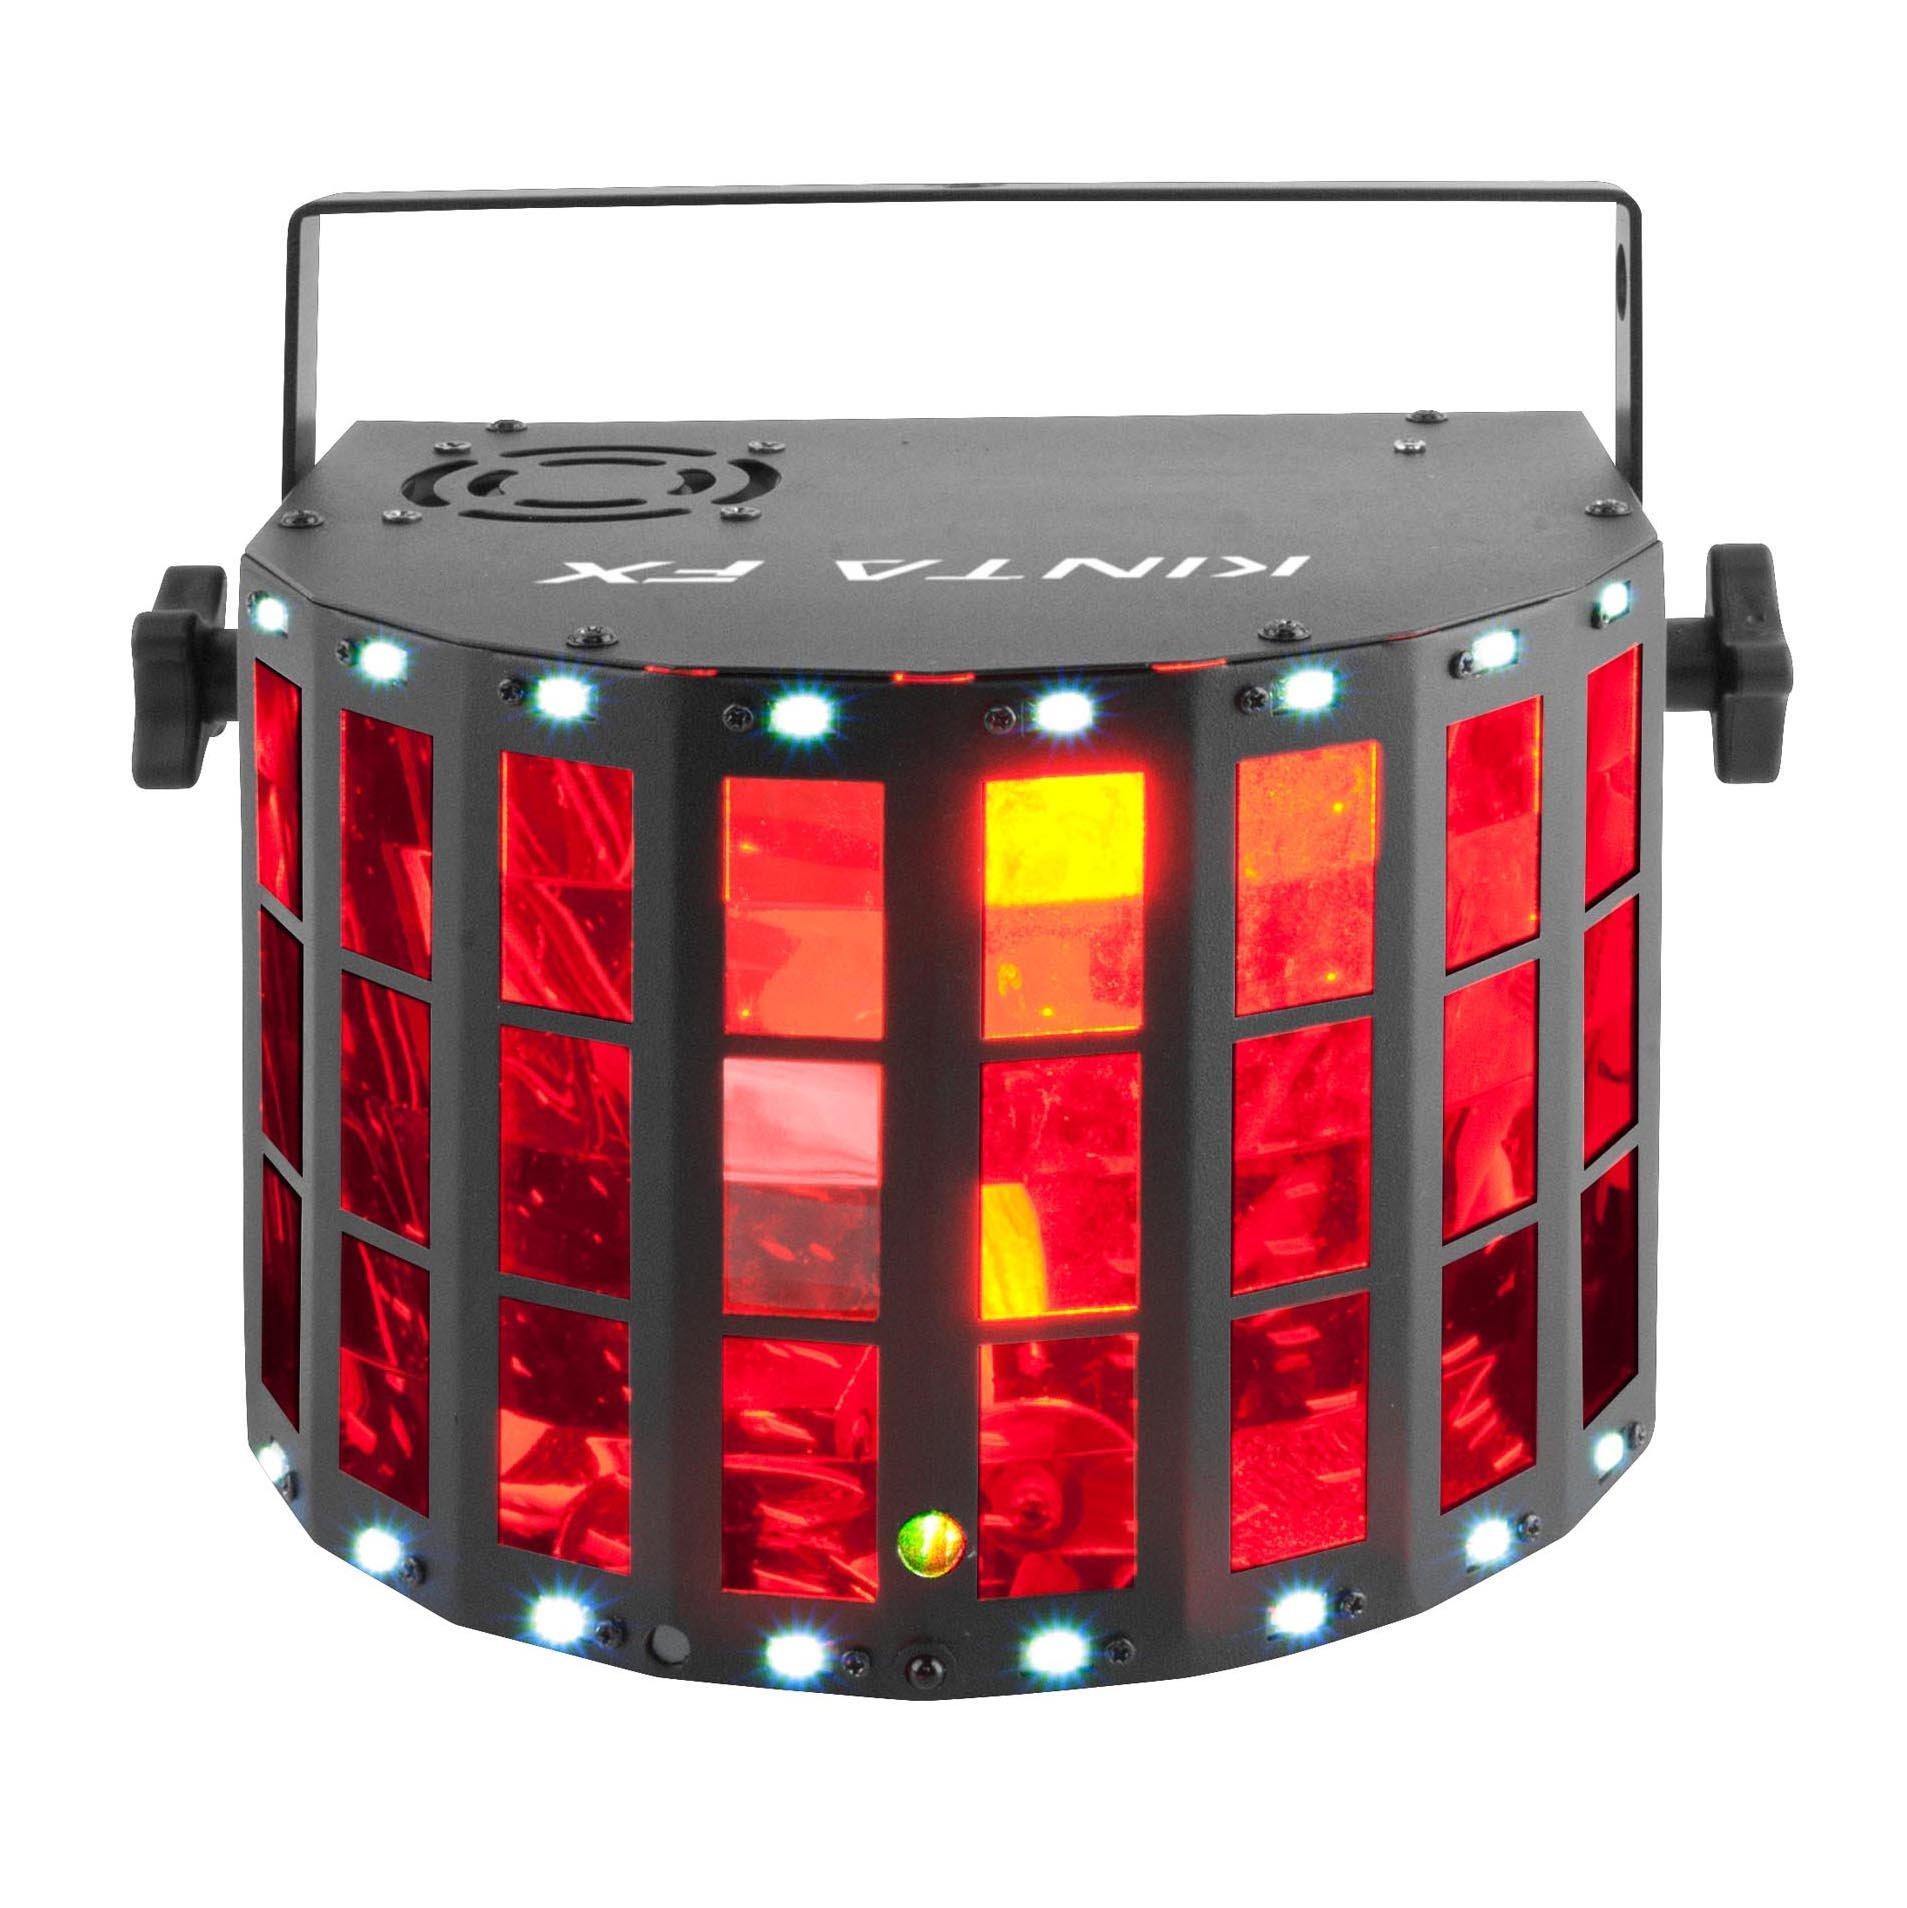 Chauvet DJ Kinta FX Multi-Effect Derby Beam RGBW LED Light w/ Laser & SMD Strobe